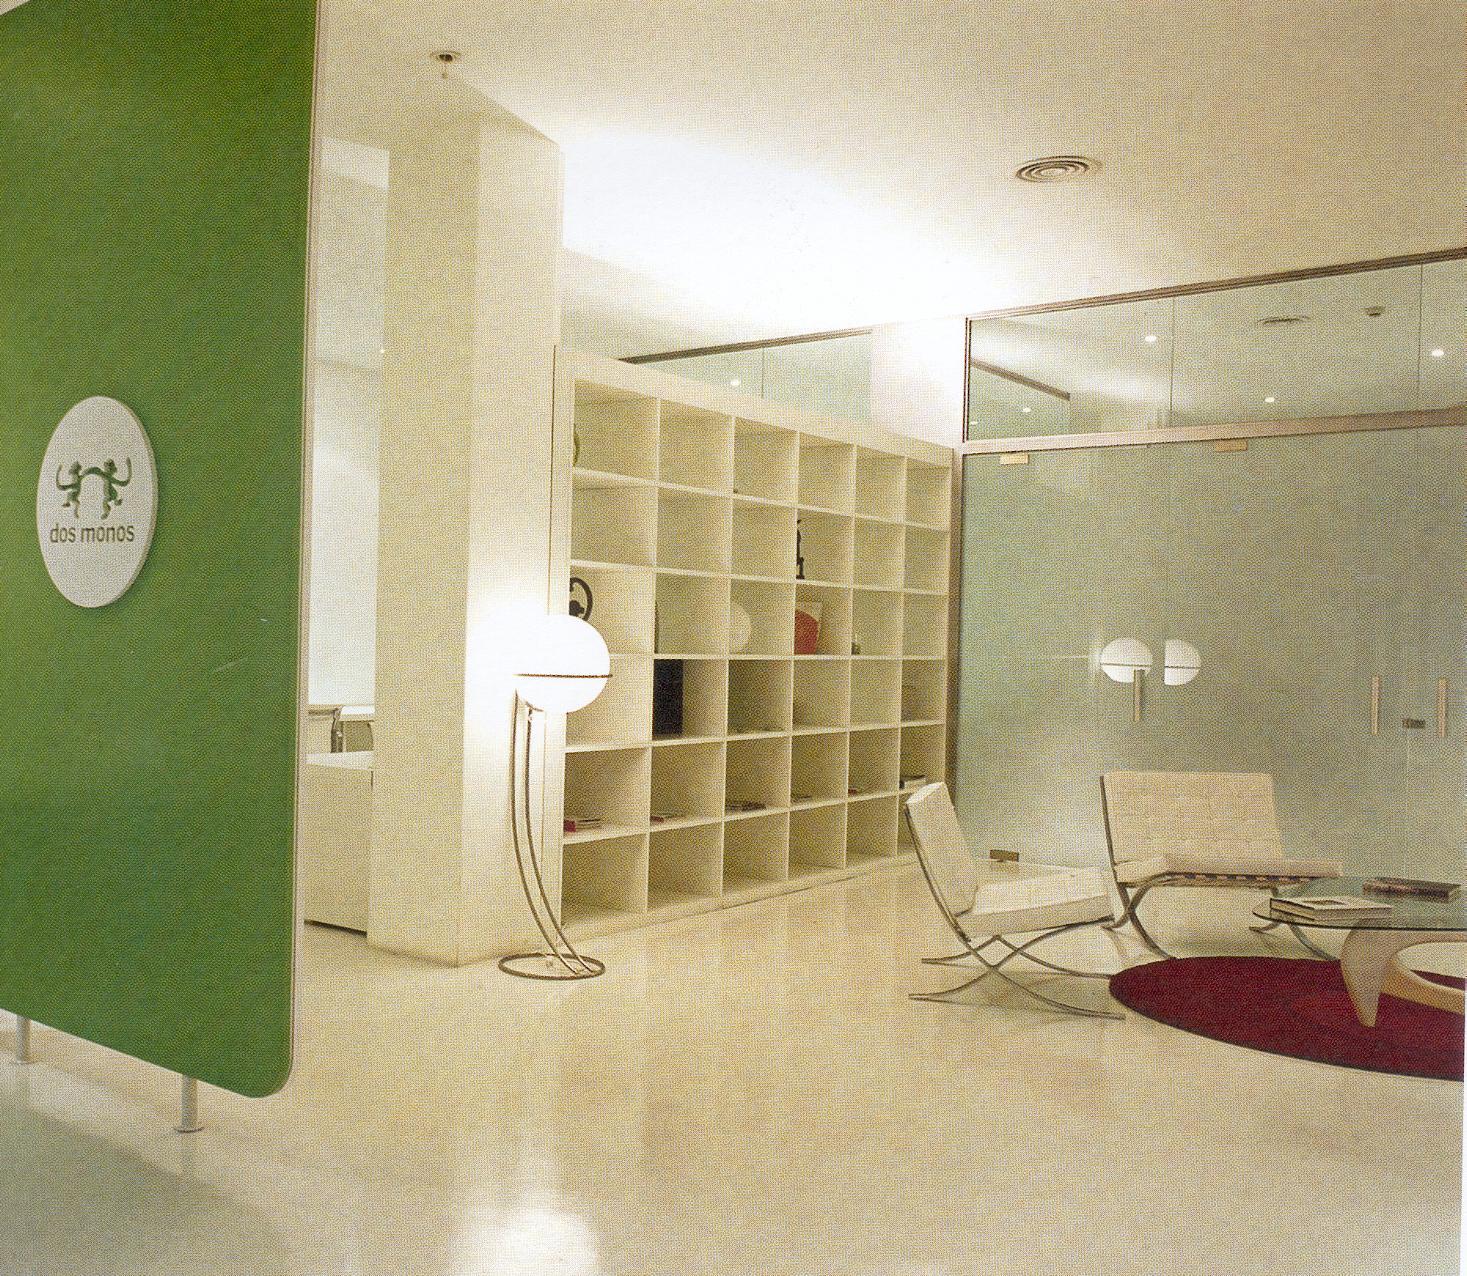 Facultad de arquitectura dise o arte y urbanismo for Estudiar diseno de interiores